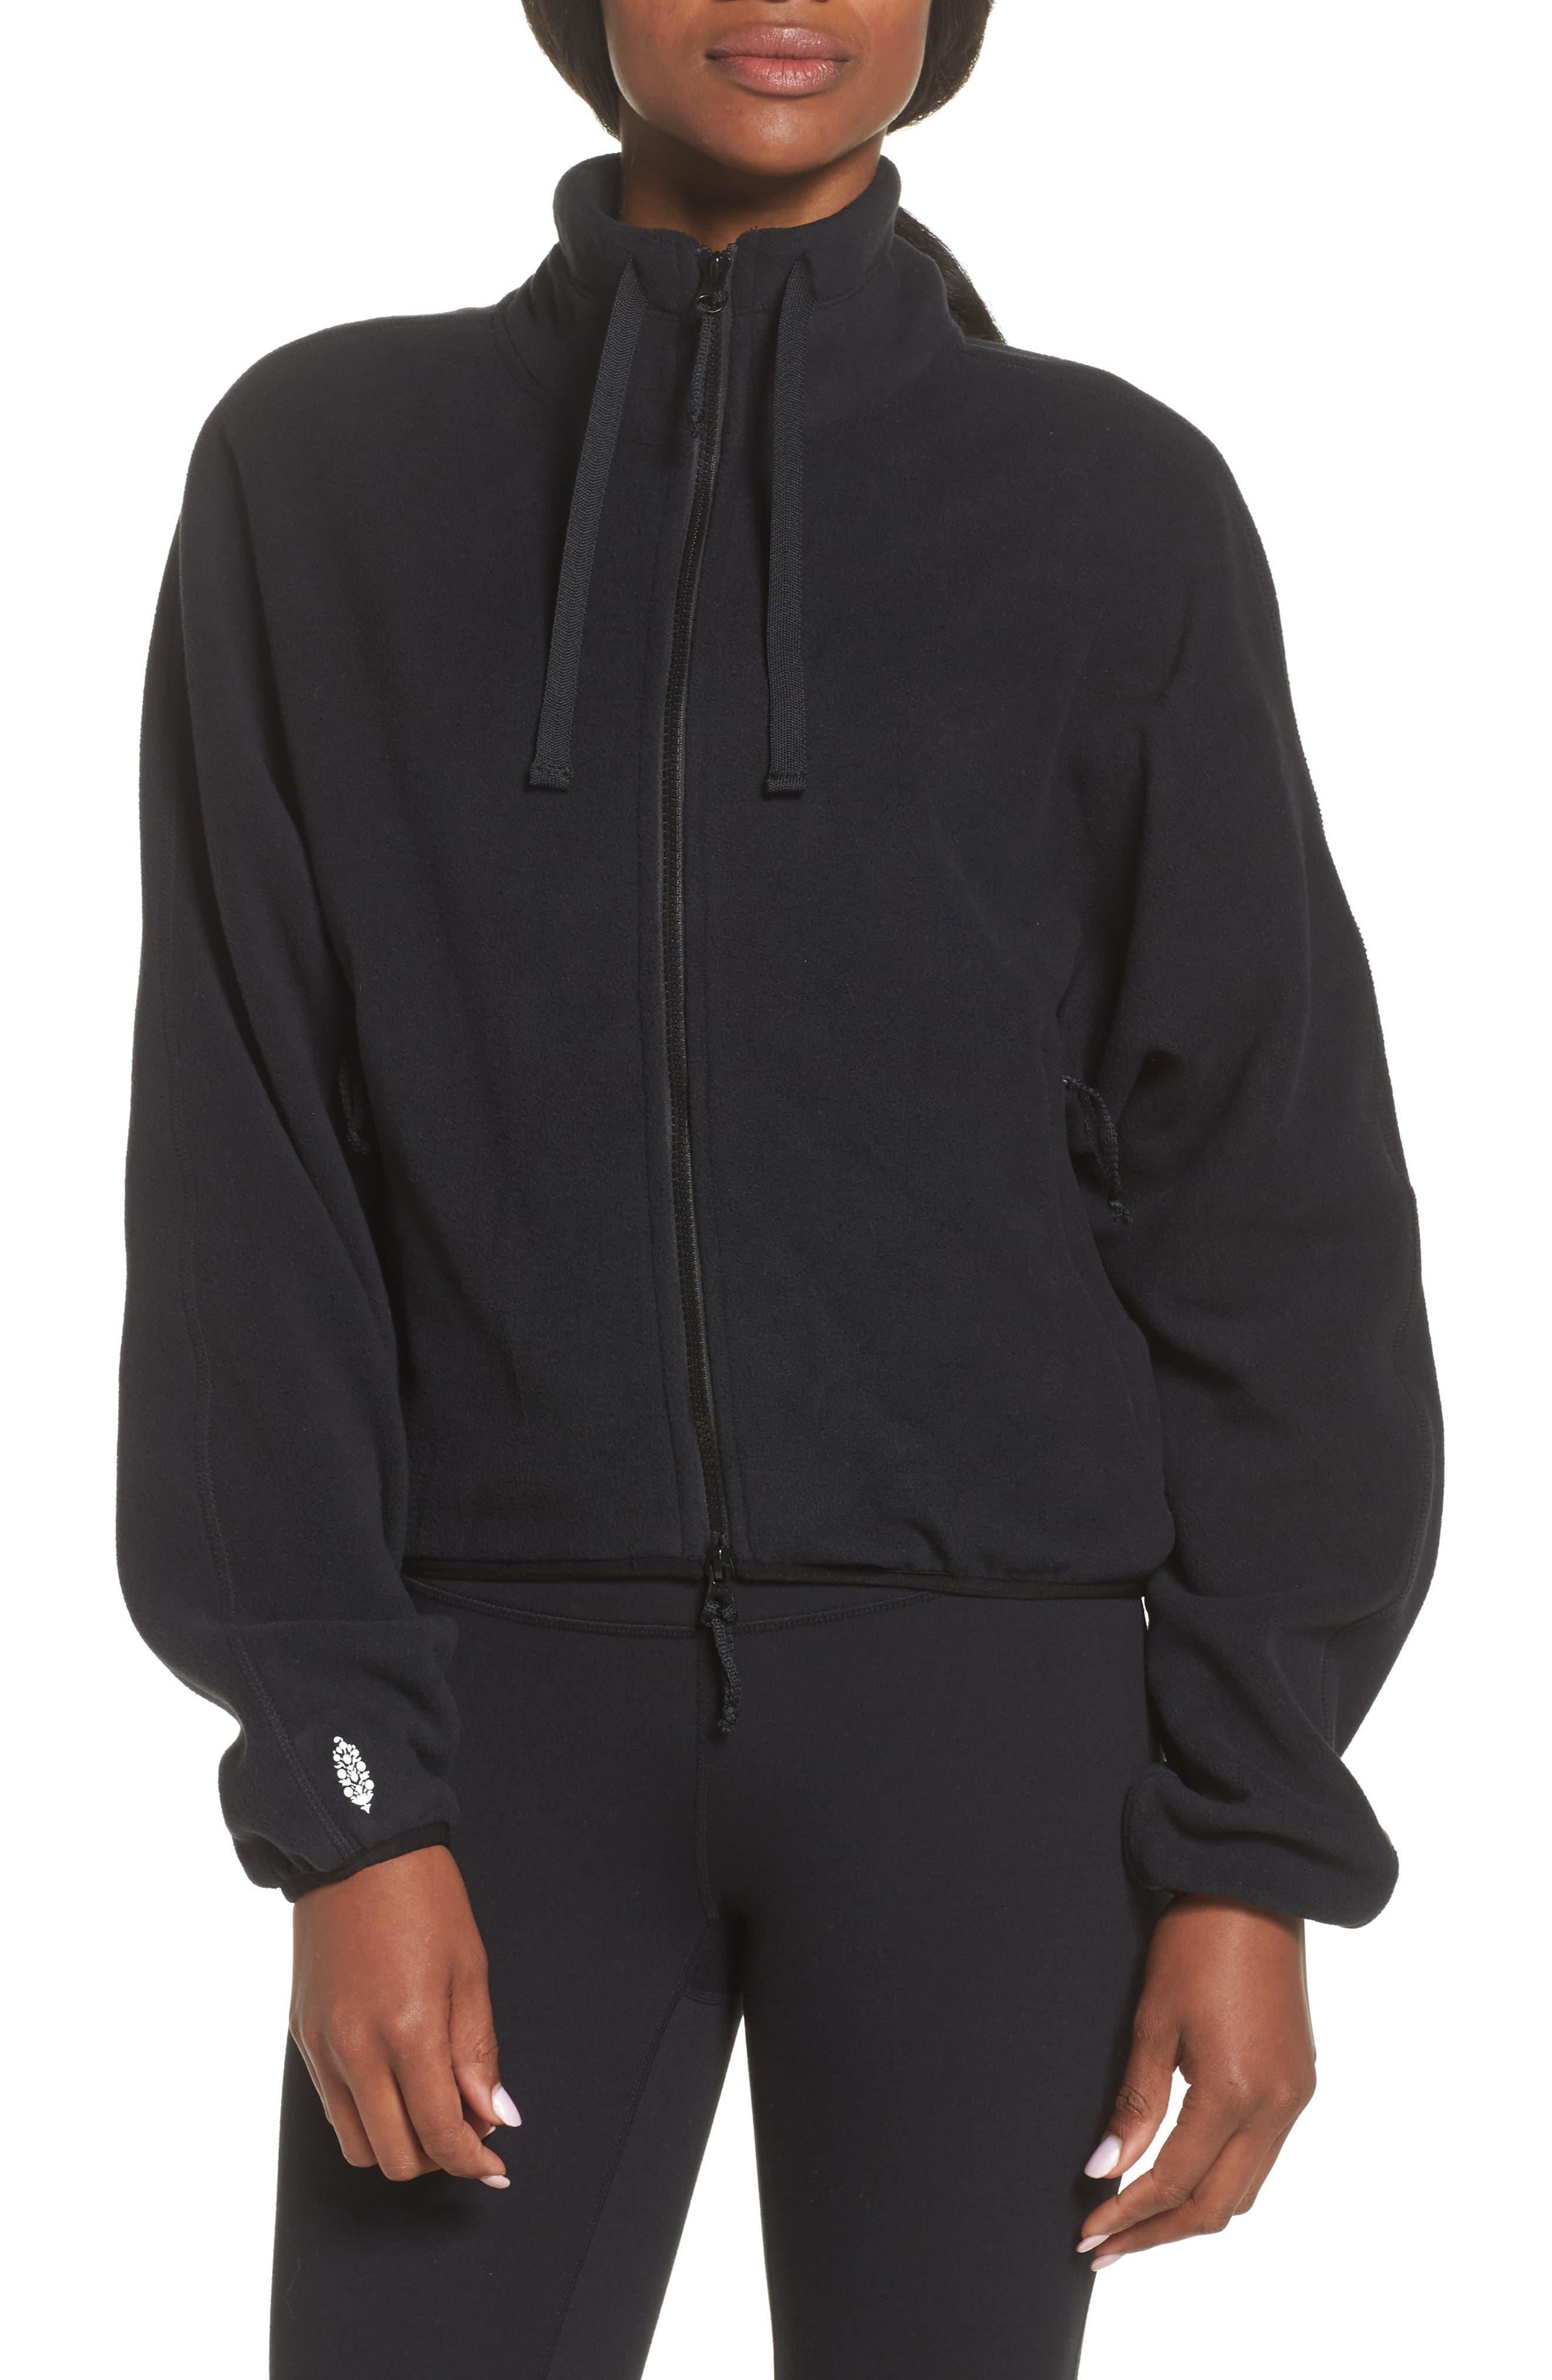 FP Movement Higher Ground Fleece Jacket,                             Alternate thumbnail 8, color,